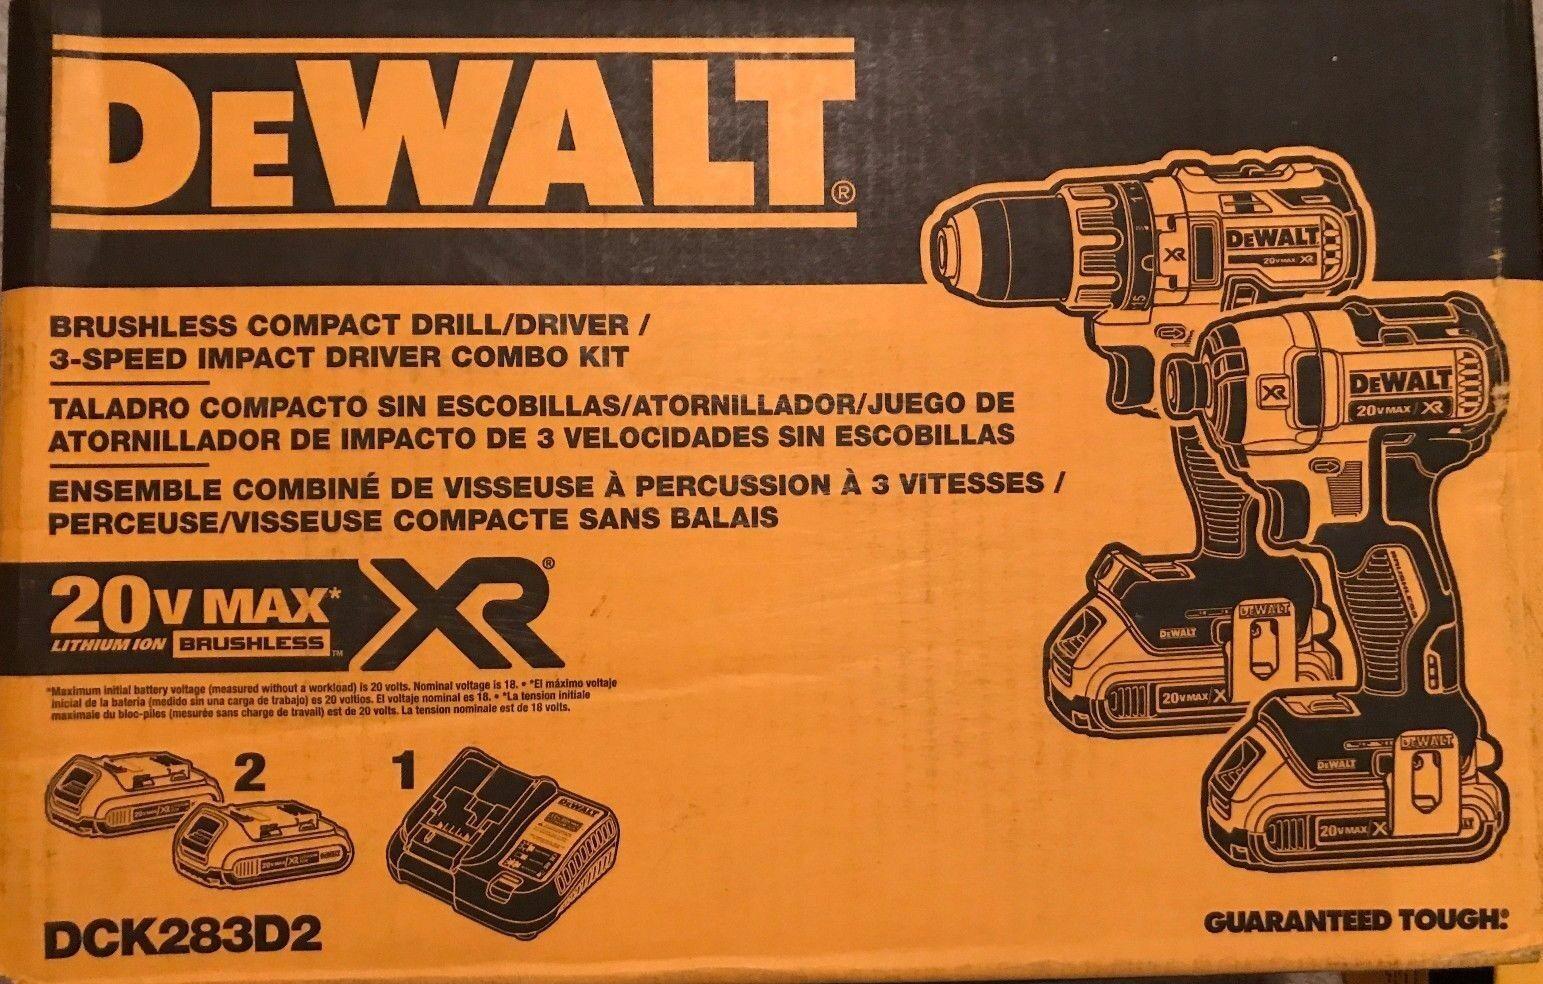 DEWALT DCK283D2 20V 20 Volt Li-Ion Brushless Drill & Impact